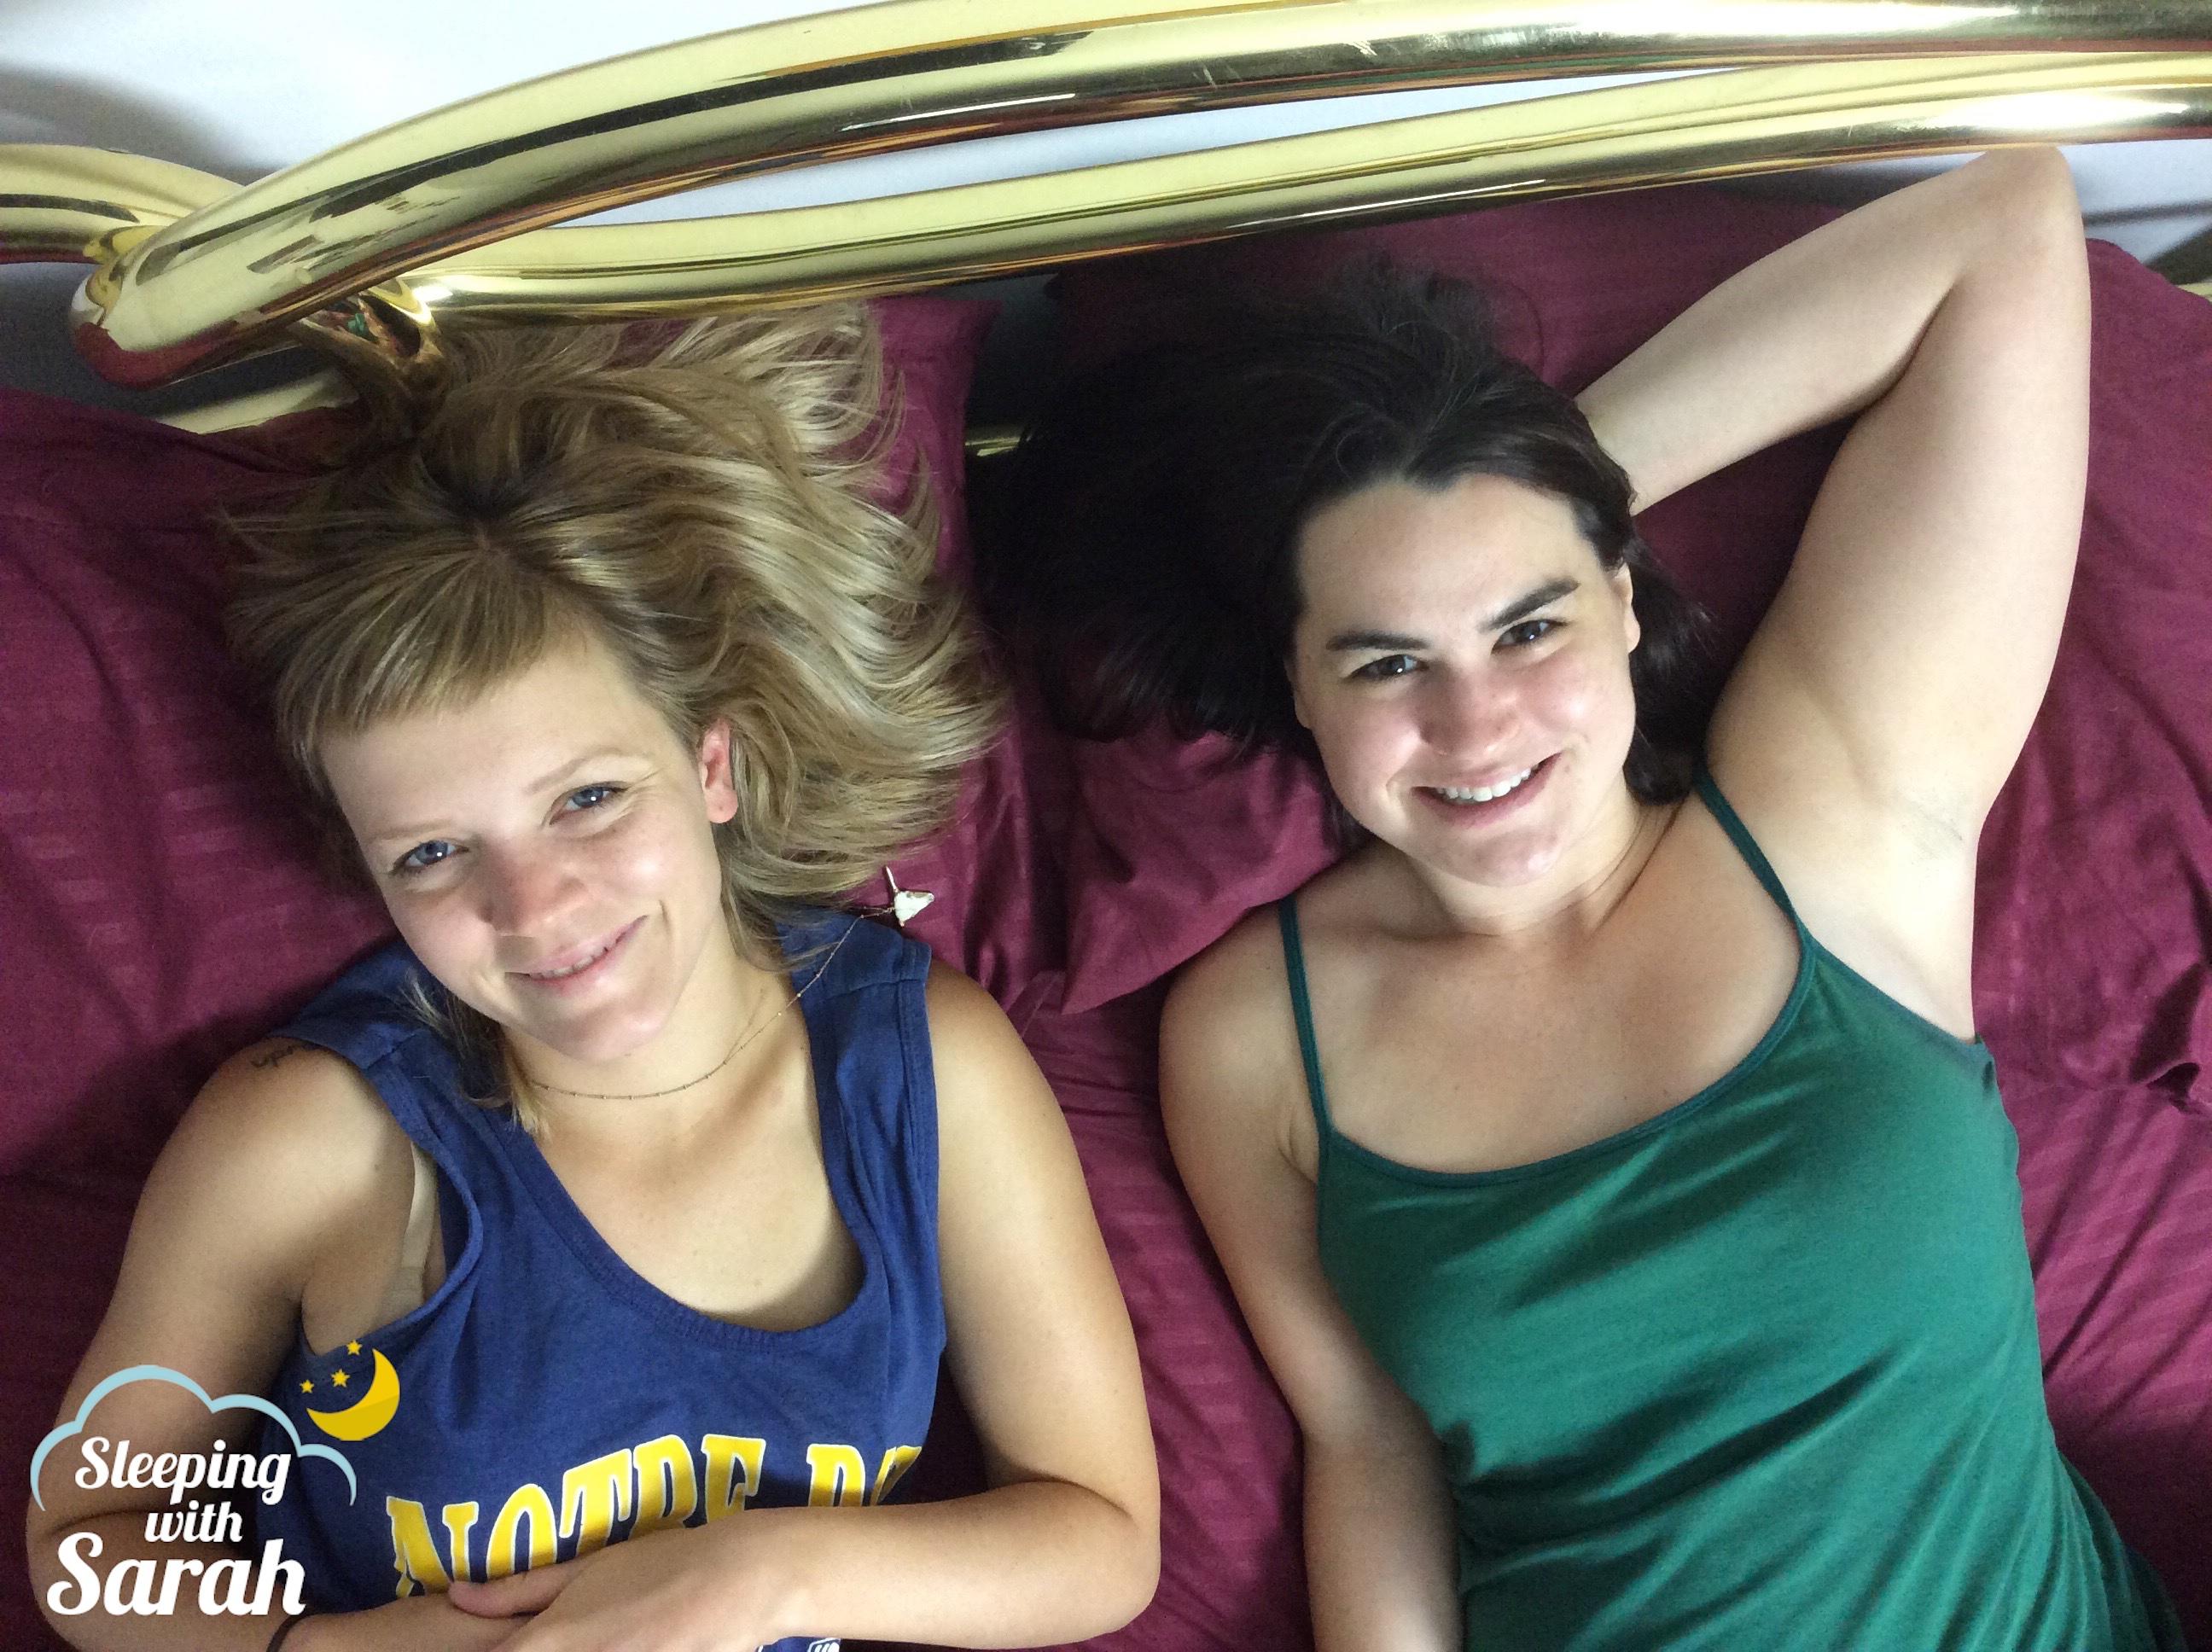 Grace Lusk & Sarah Albritton Sleeping with Sarah podcast